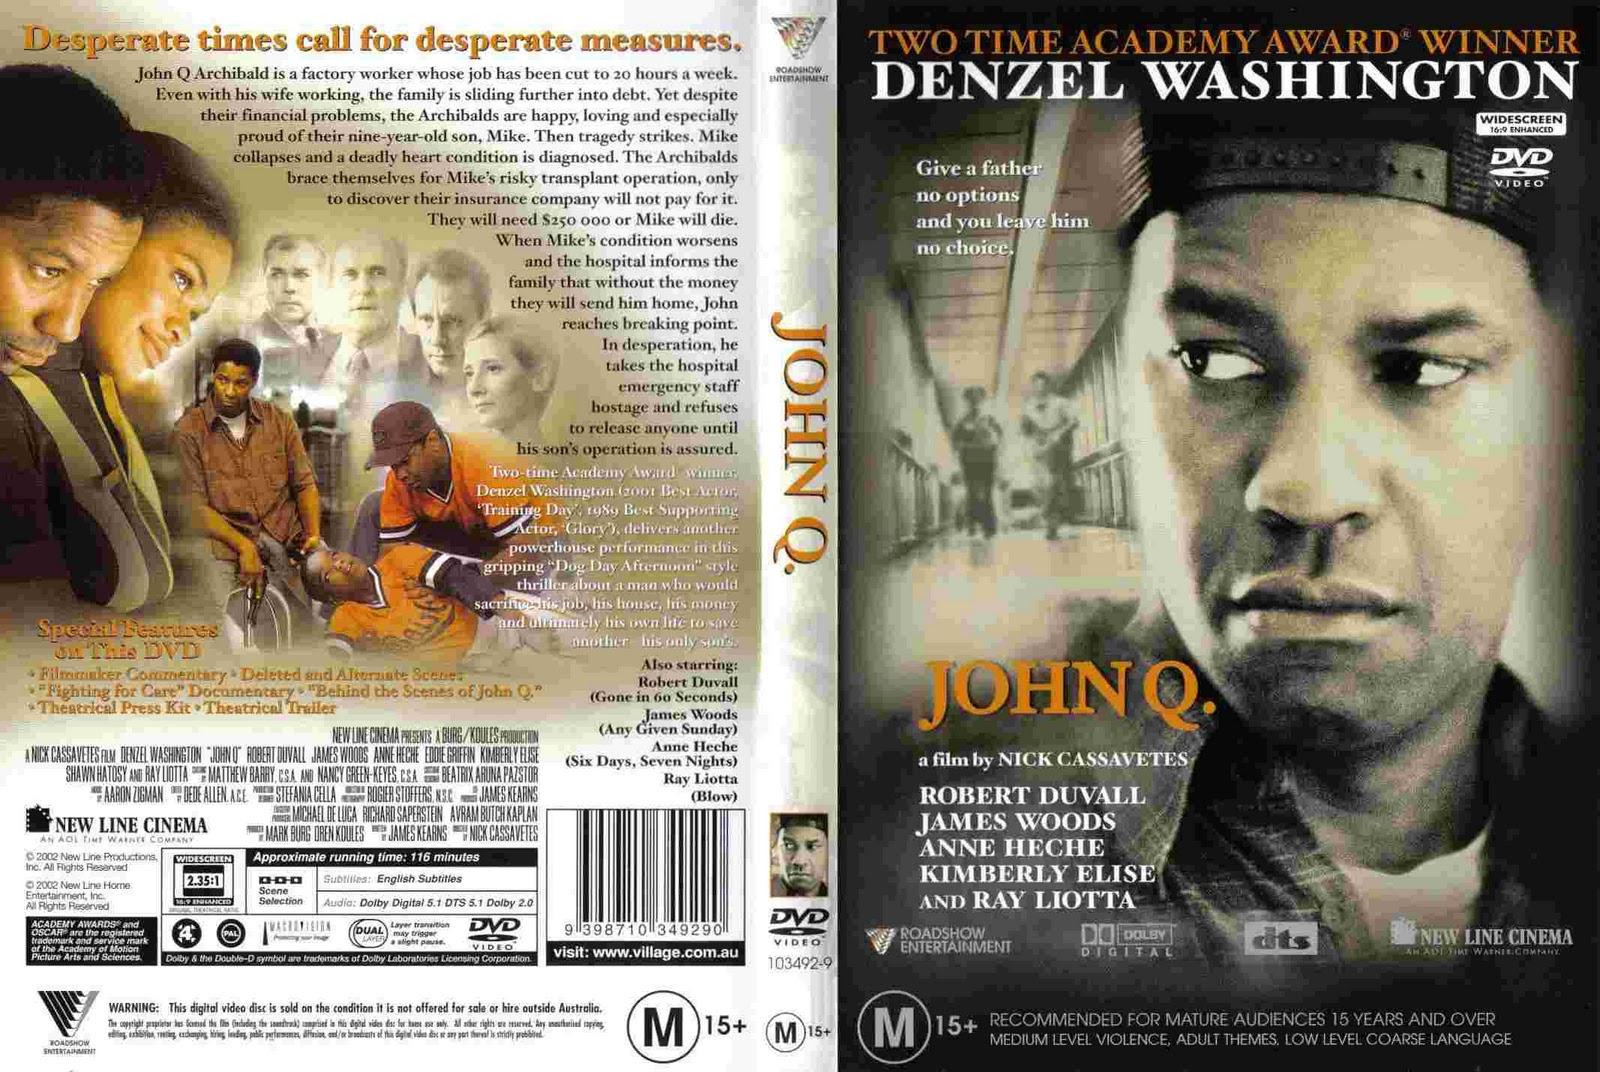 john q 2002 download avgedown